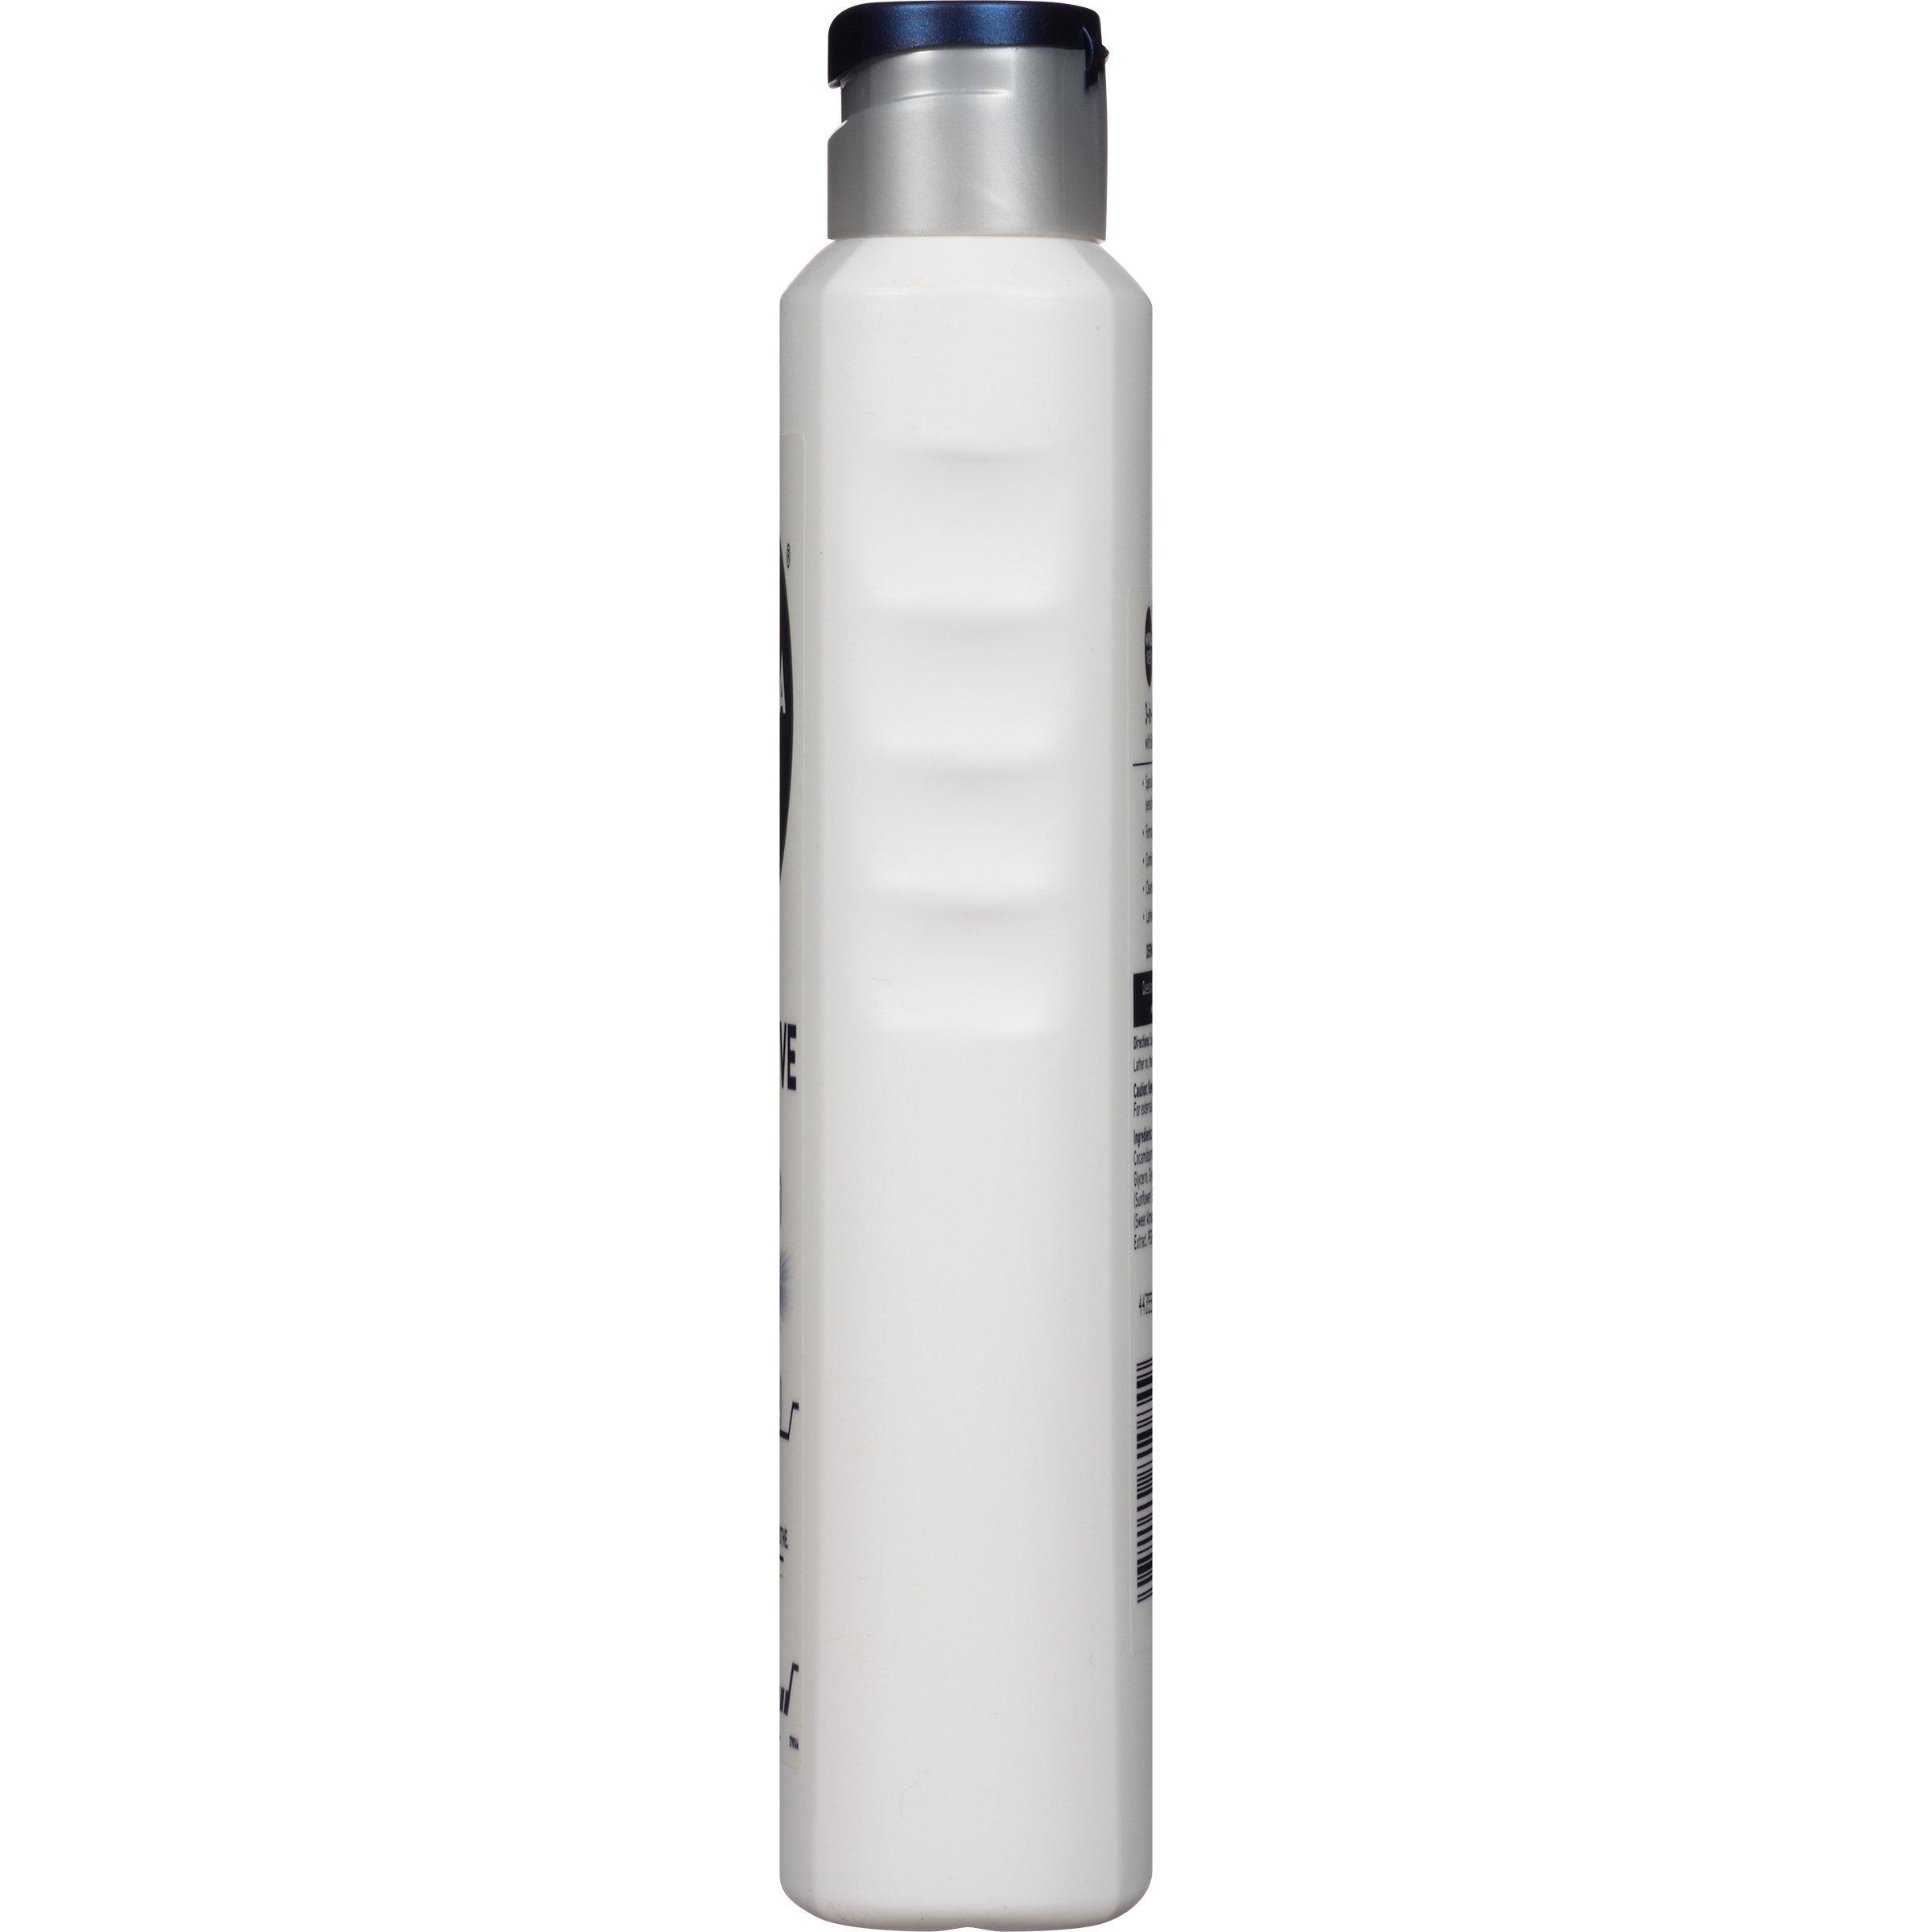 NIVEA Men Sensitive 3-in-1 Body Wash - Shower, Shampoo and Refresh, Soap and Dye-Free For Sensitive Skin - 16.9 fl. oz. (Pack of 3) by Nivea Men (Image #2)